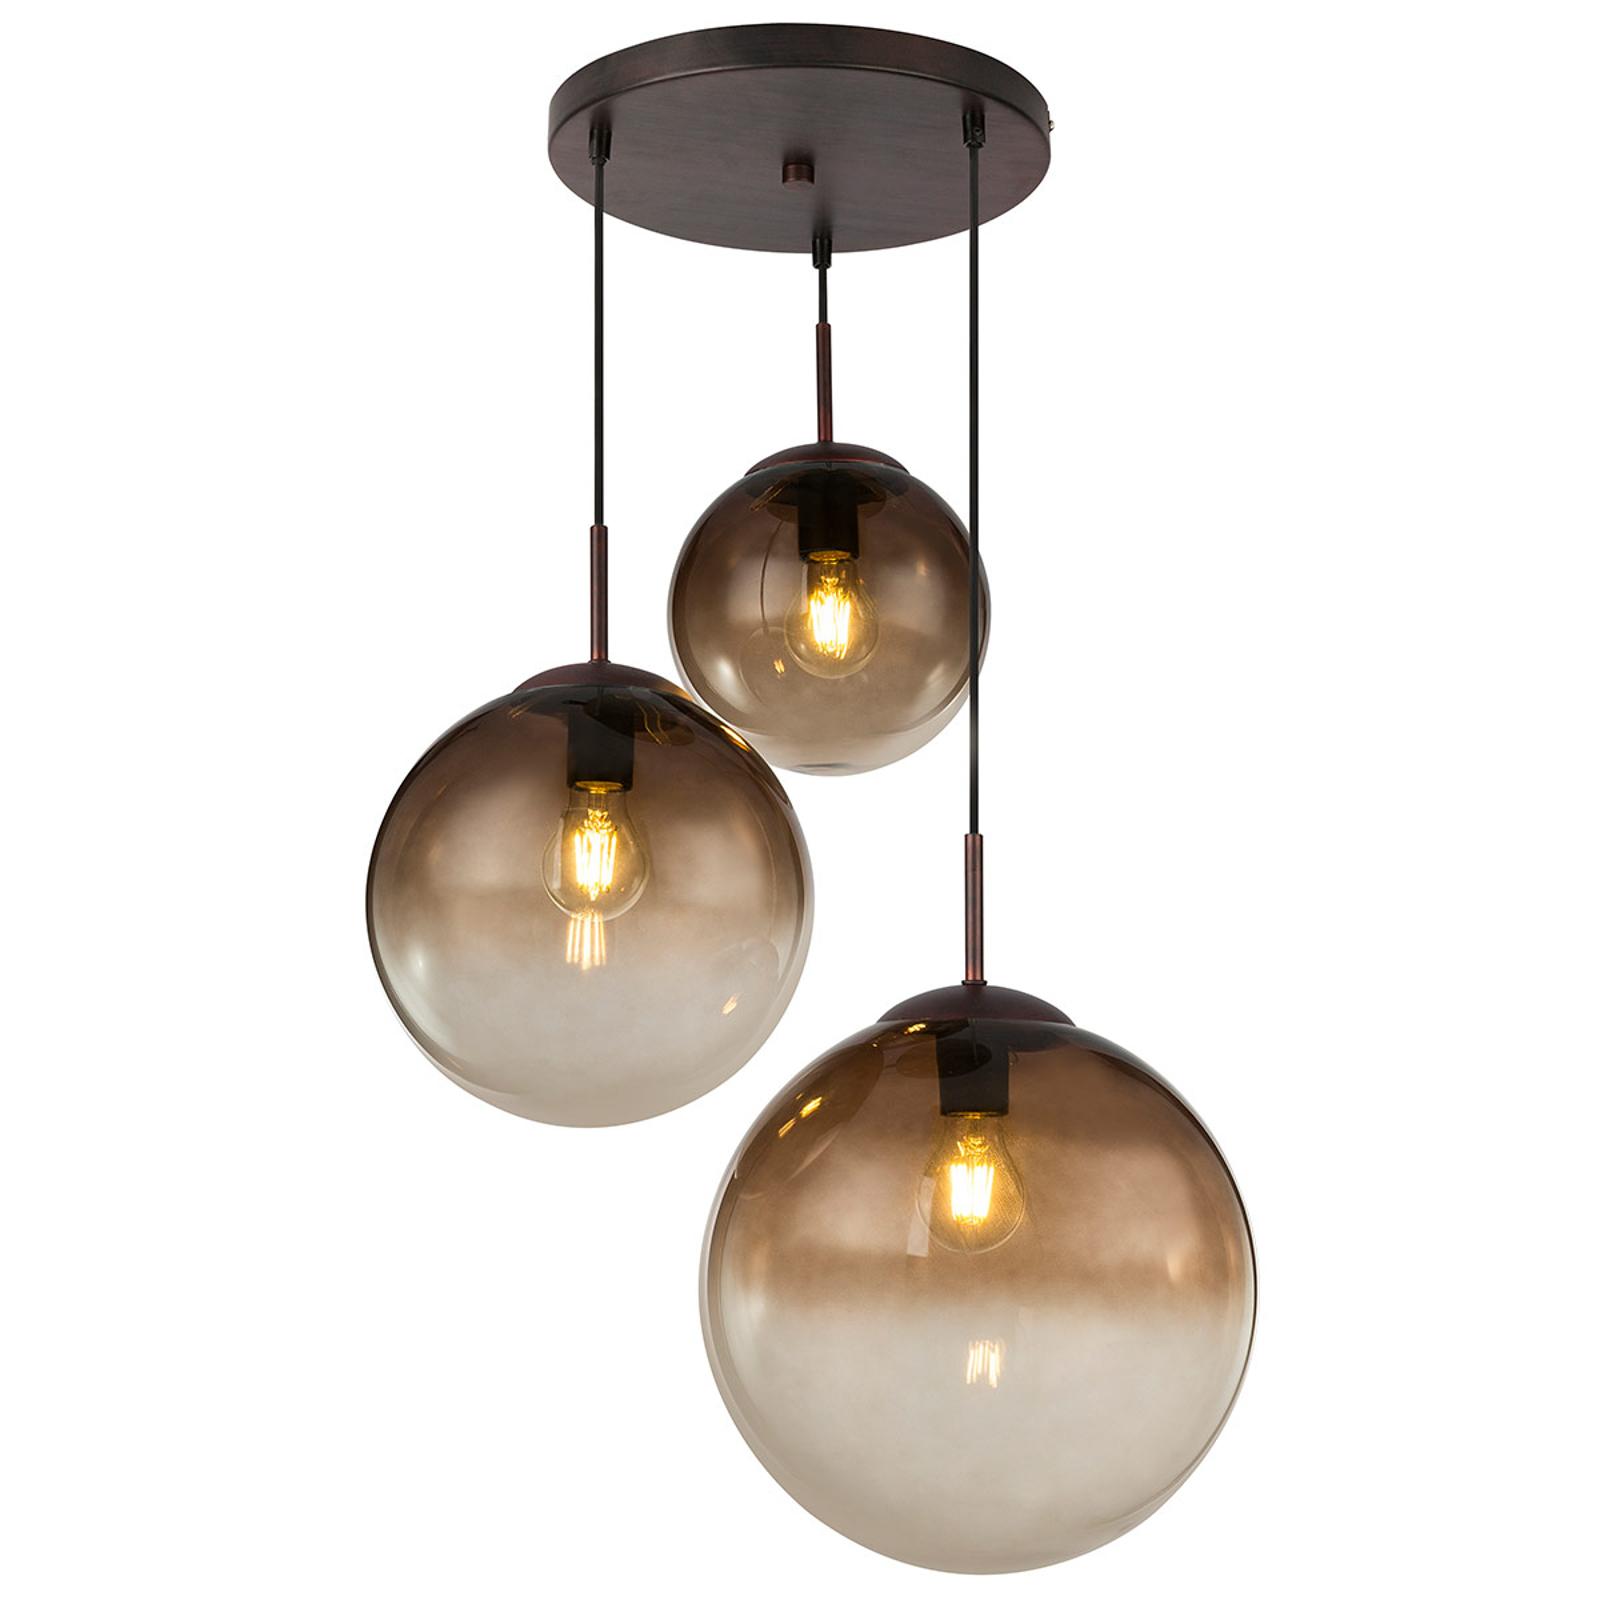 Varus glas-hængelampe, ravfarvet, 3 lk. Ø 51 cm